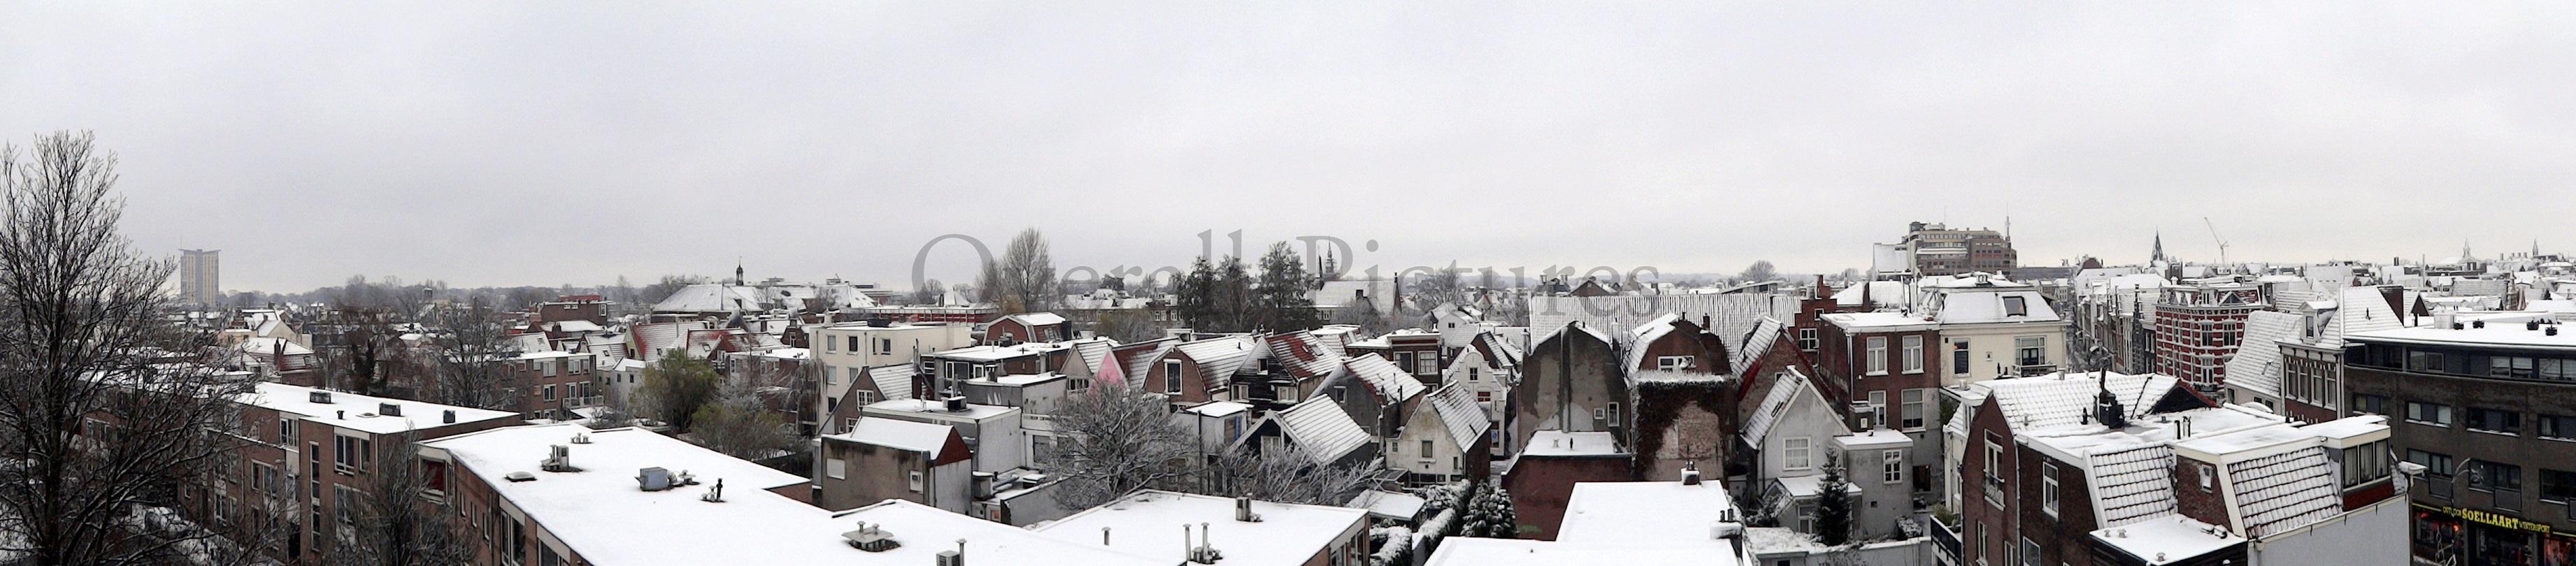 Haarlem Winter sleep panorama Sony